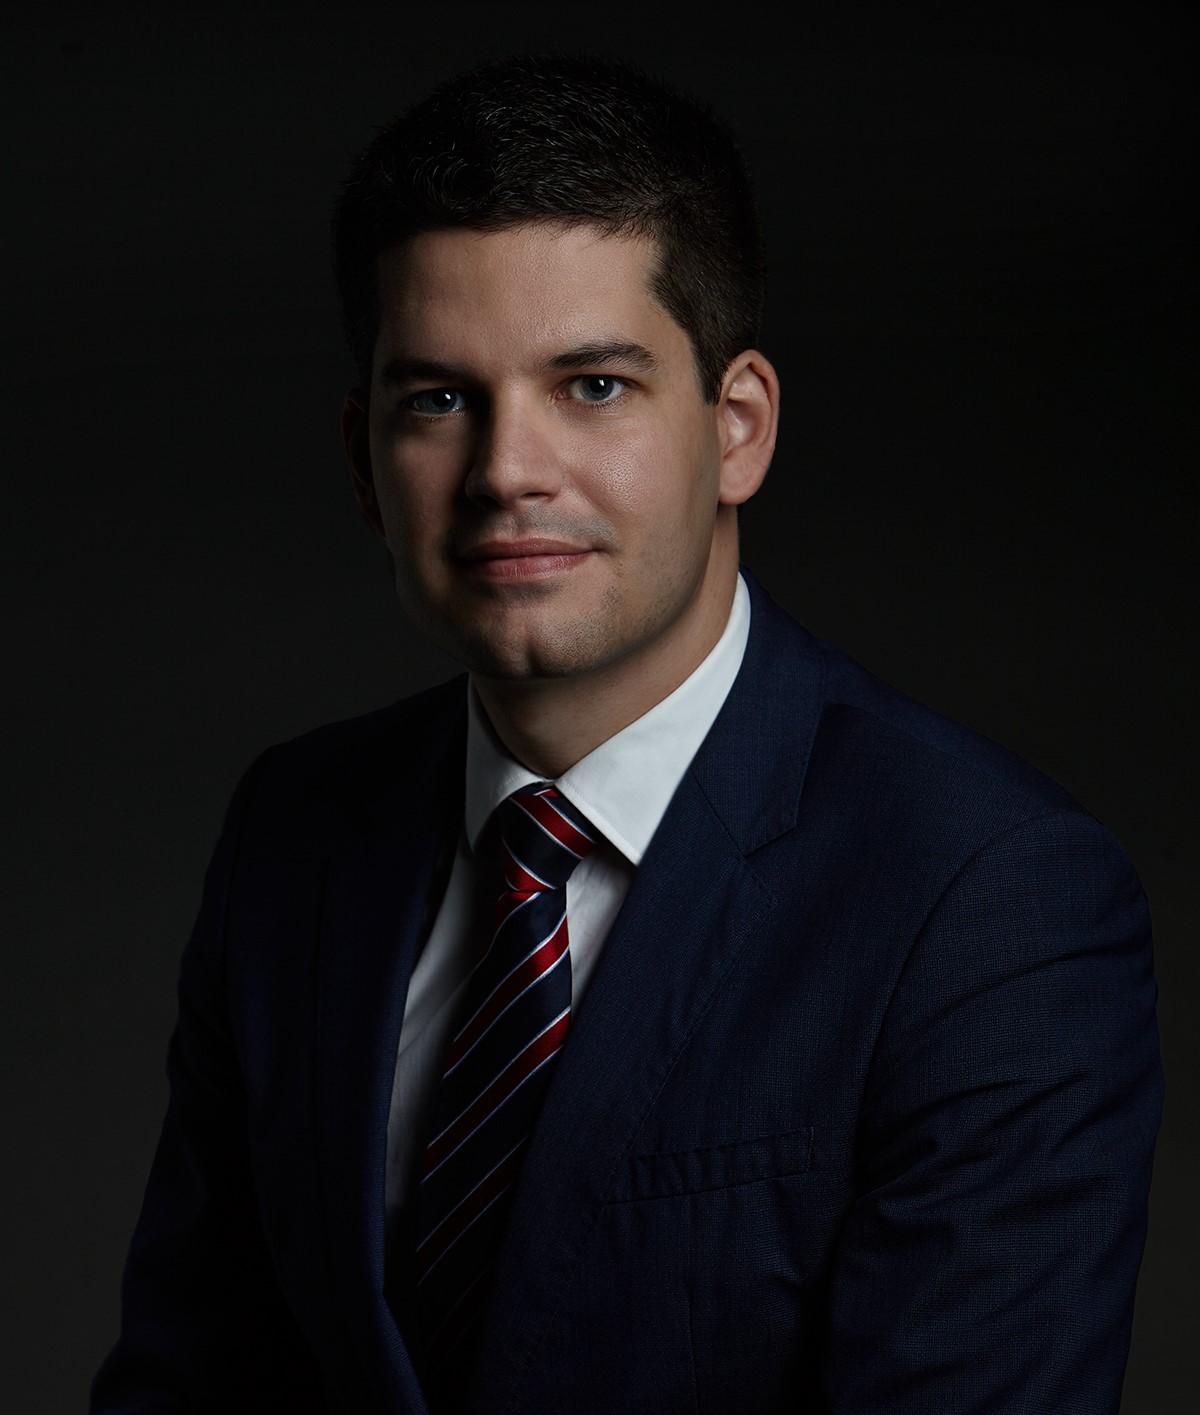 Dr. Zsolt Stubenvoll